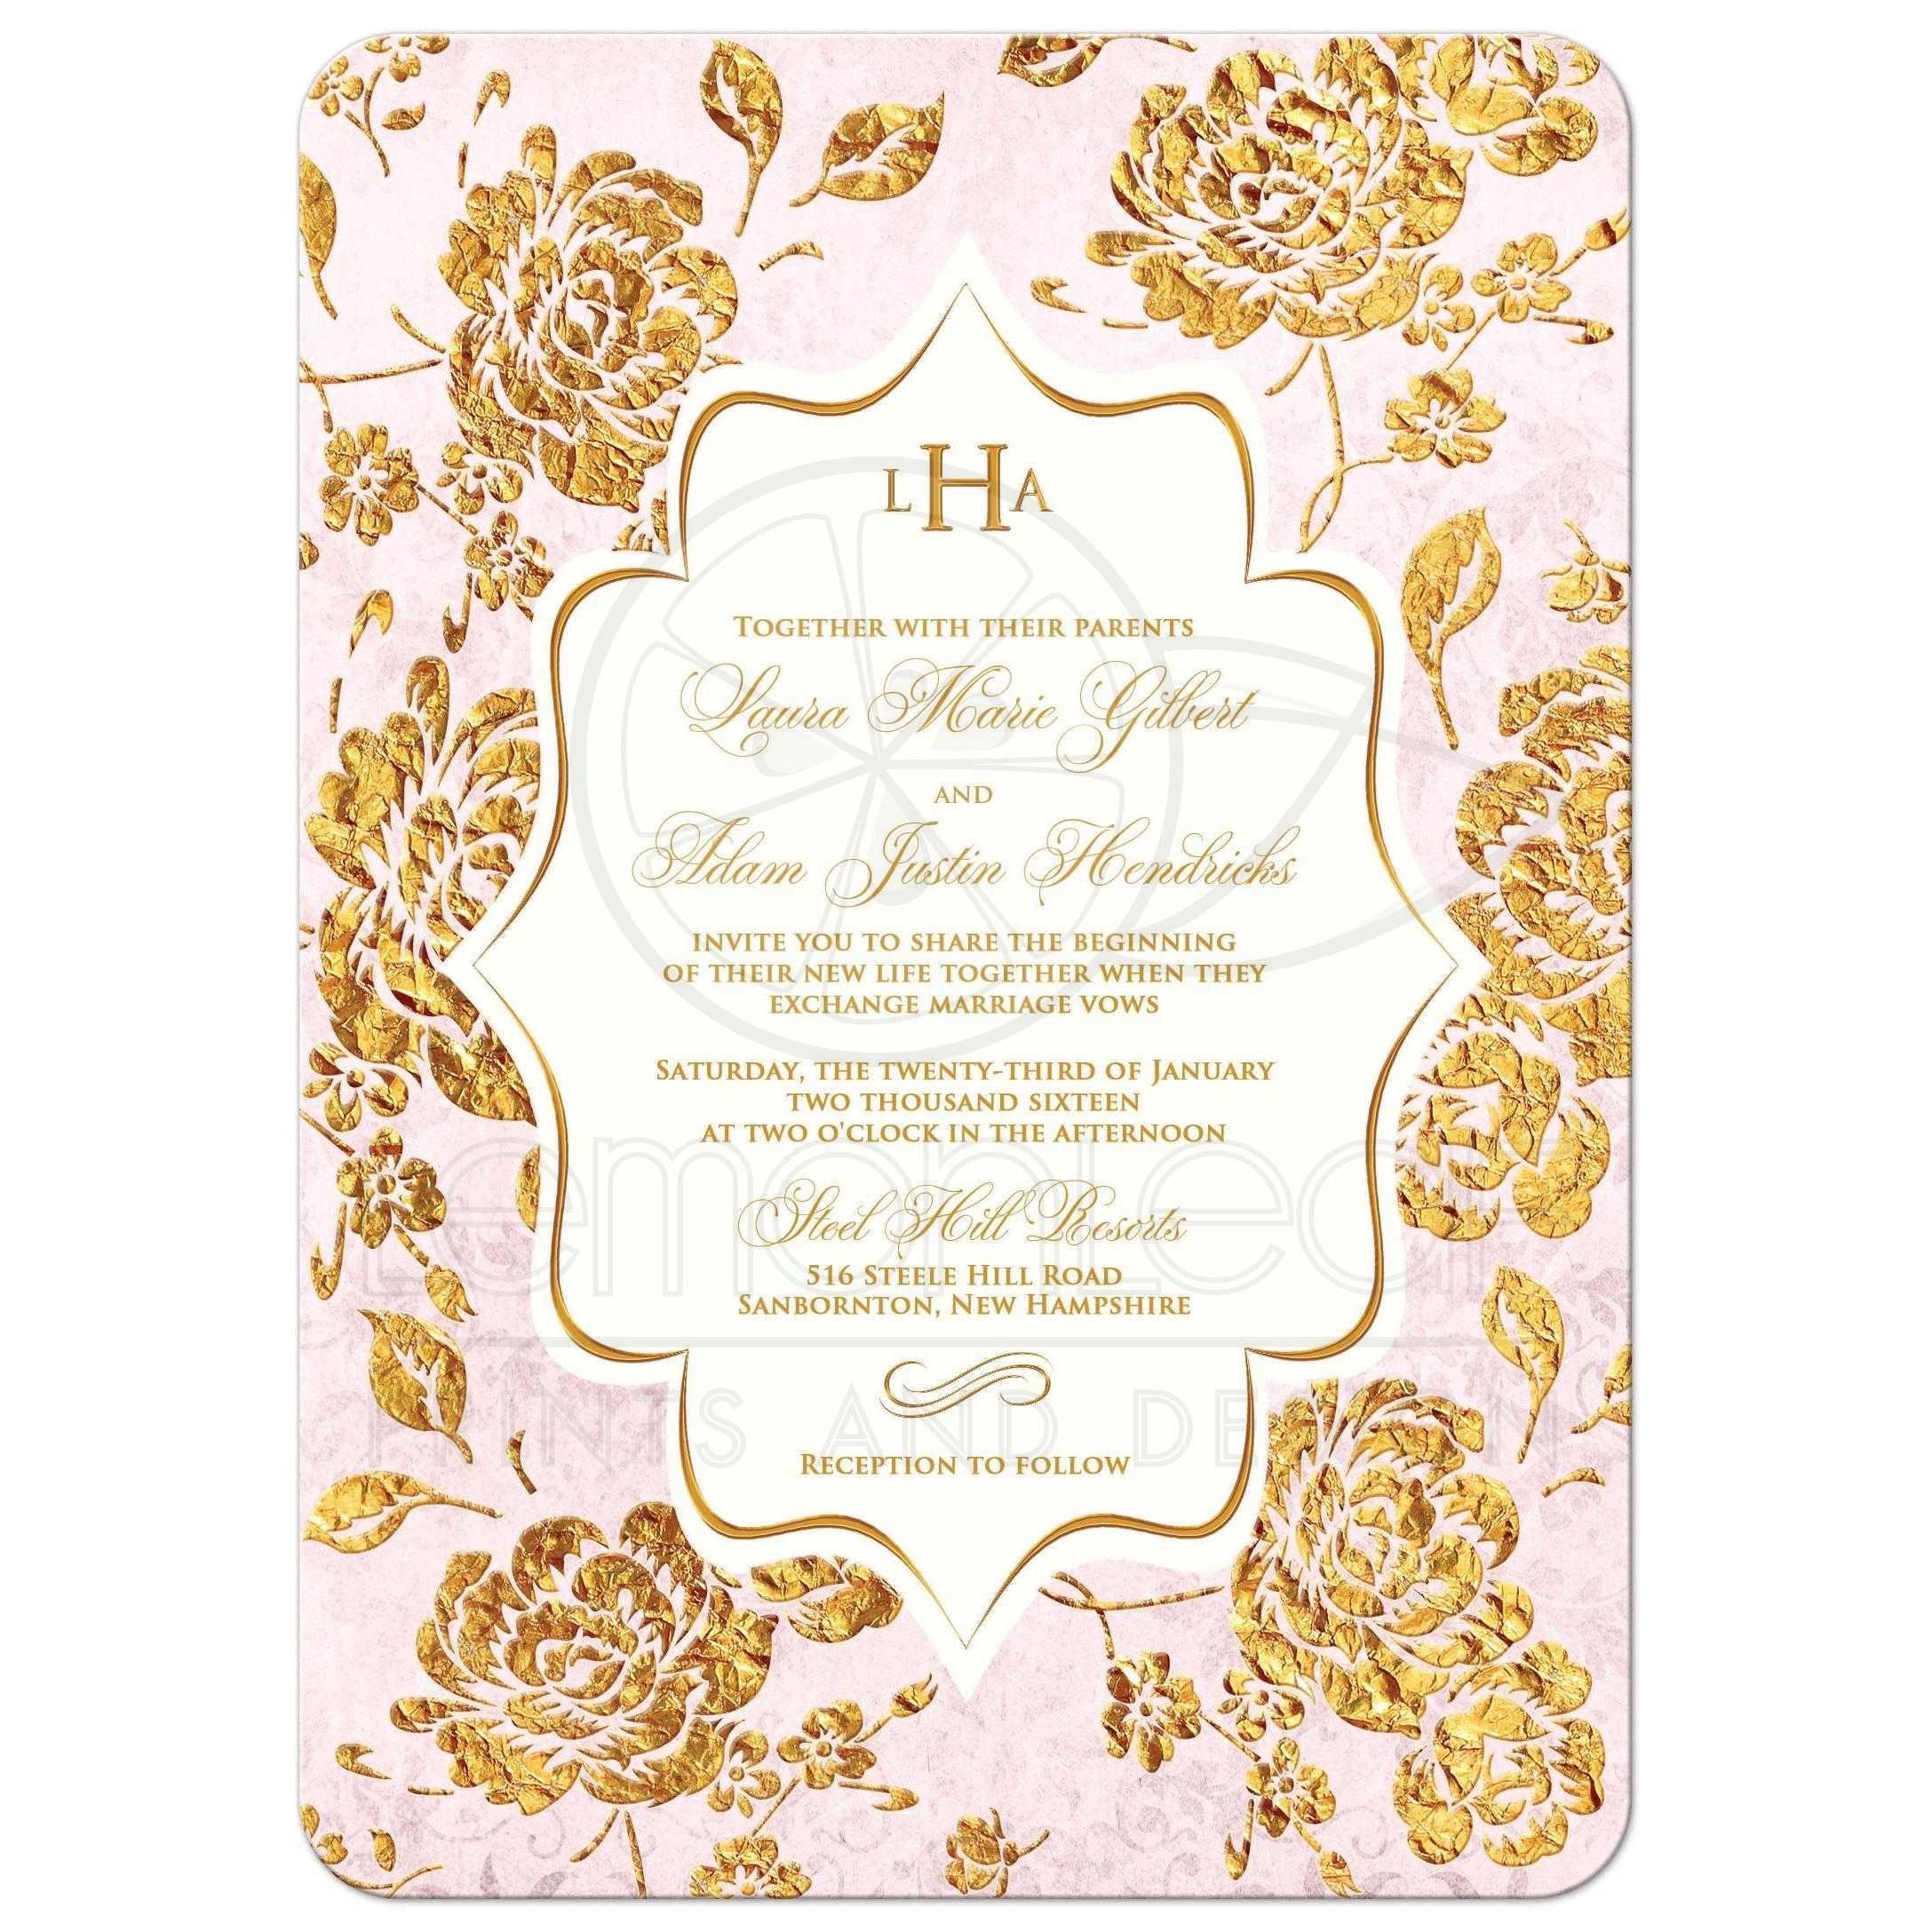 Home Office Decor Wedding Invitation Vintage Floral Blush Pink Ivory